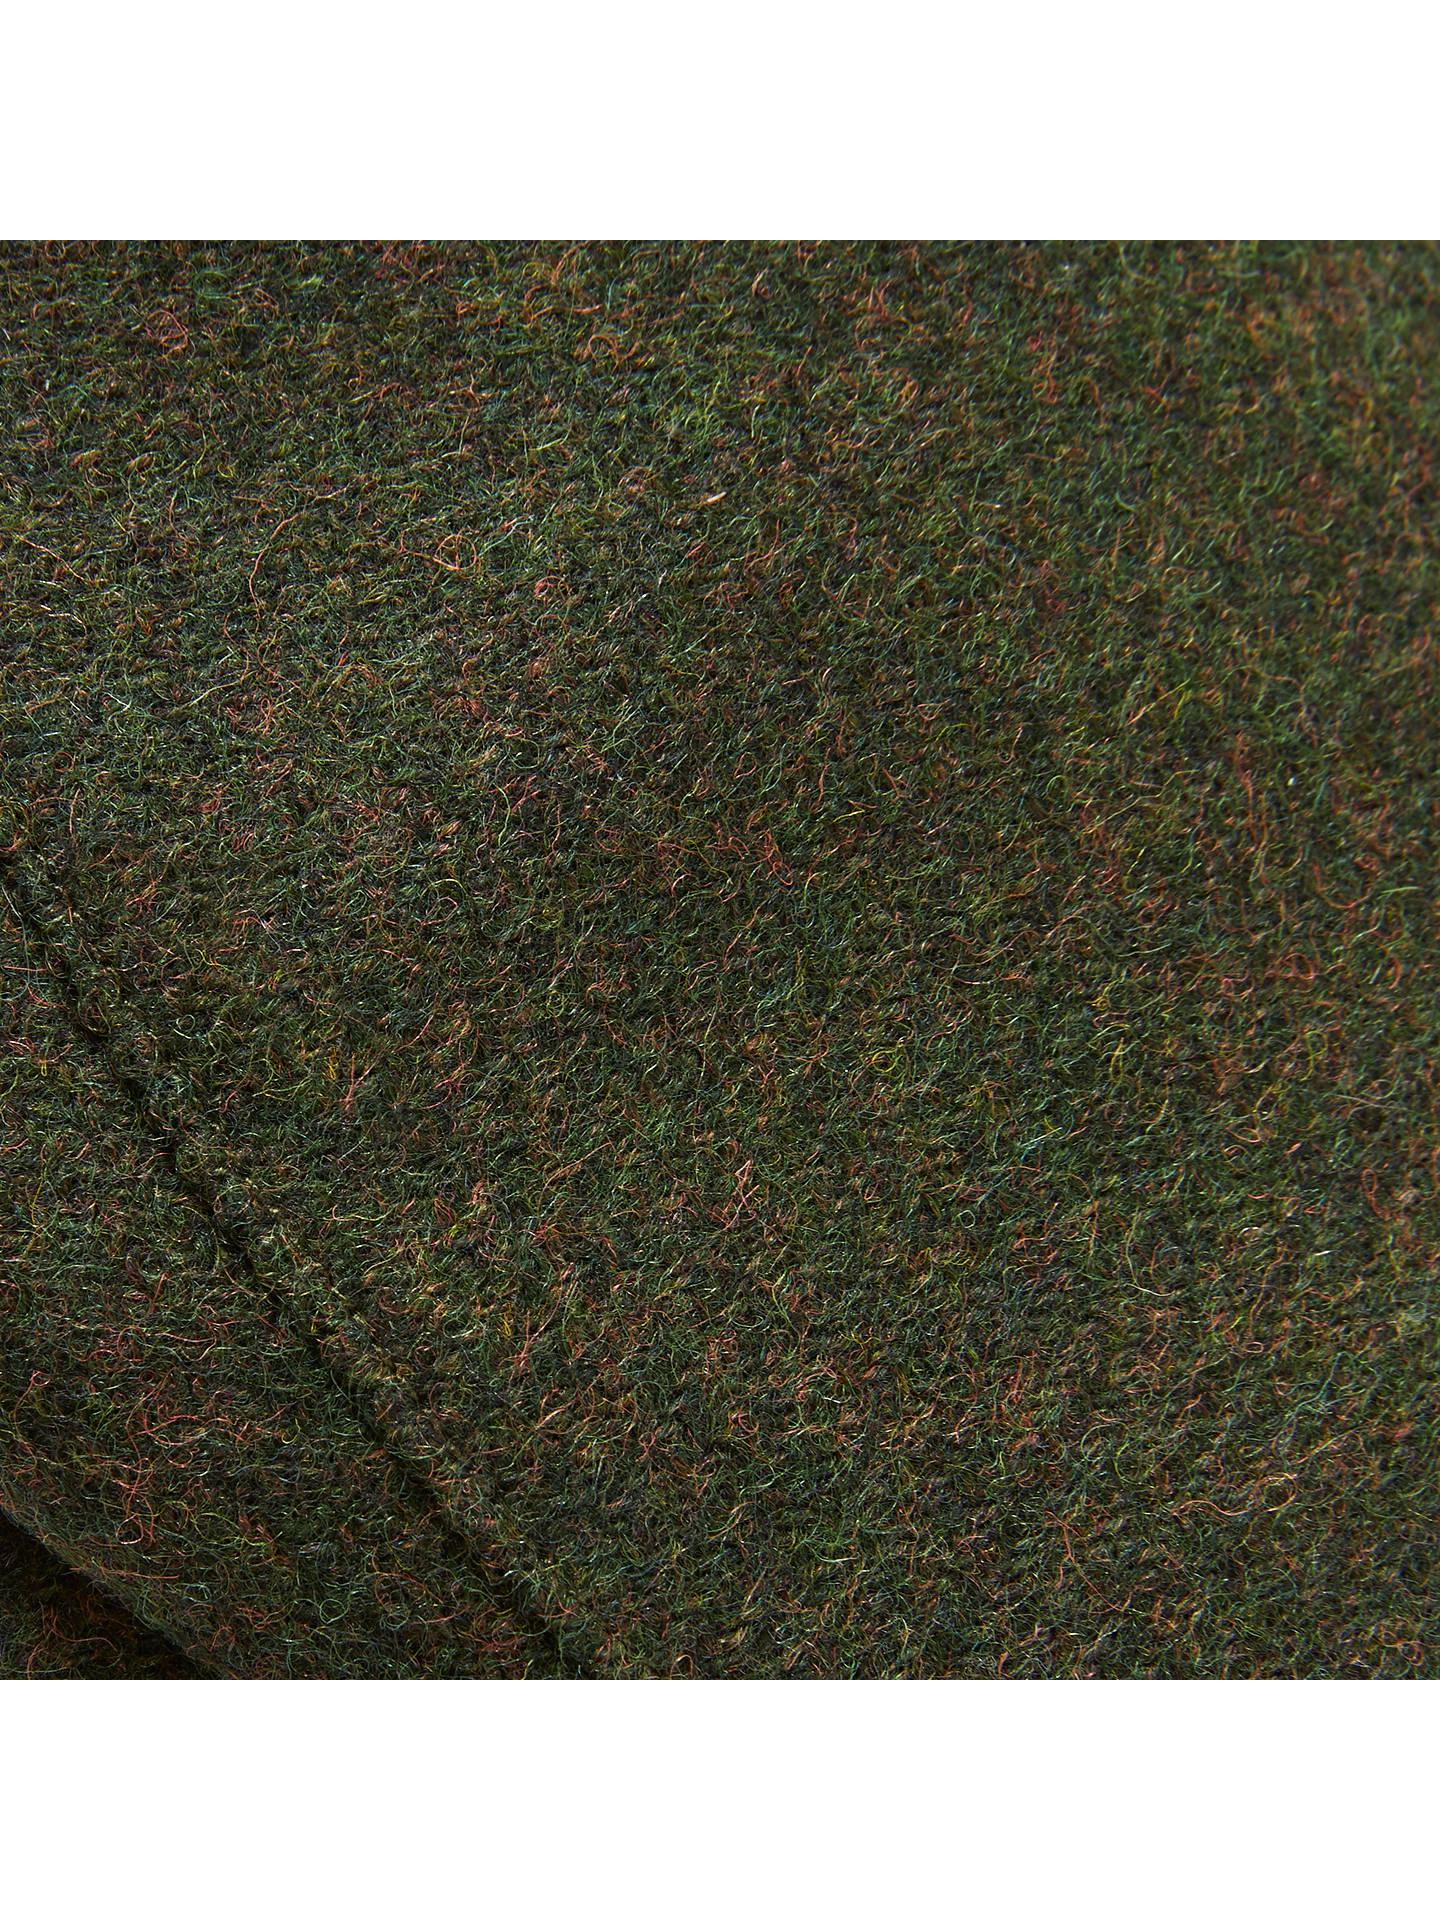 0ba50e8e8 John Lewis Moons Check Flat Cap, Green at John Lewis & Partners